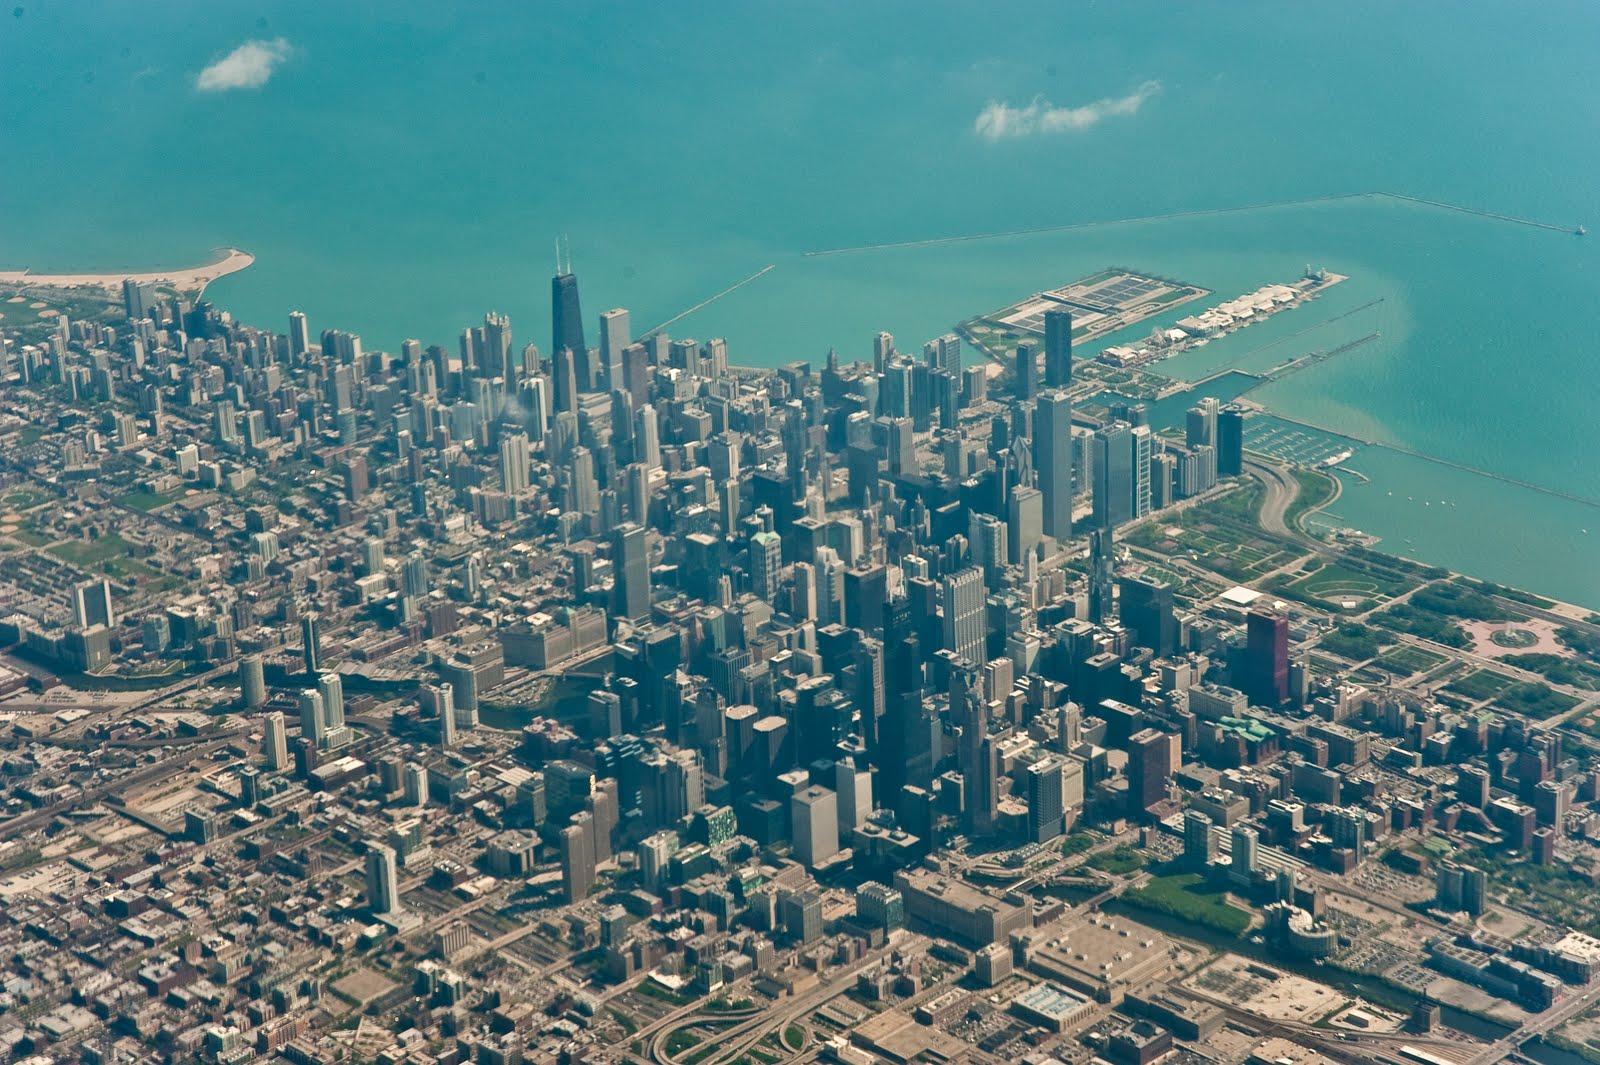 http://4.bp.blogspot.com/_5yT-HGxp5uo/S95GMYoKvKI/AAAAAAAADfw/VaPZQwOdlhE/s1600/ChicagoAirplaneView+(1+of+1).jpg